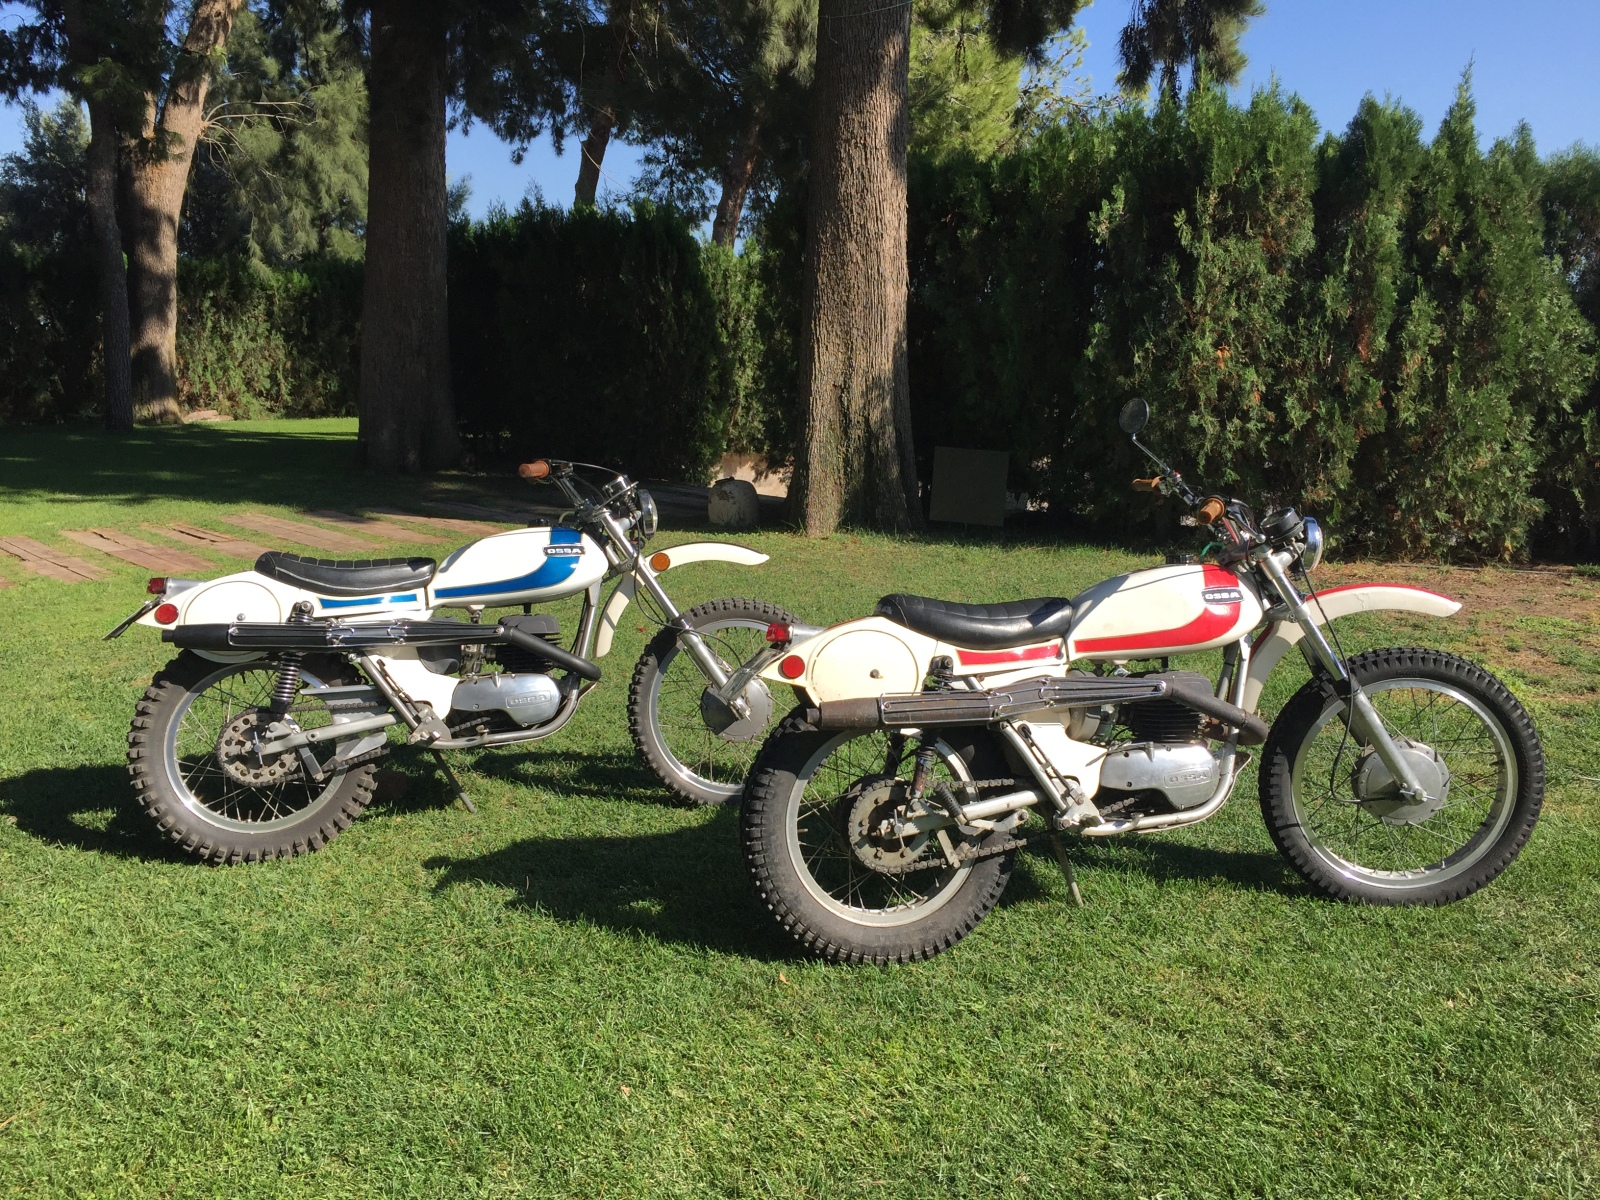 Colección TT Competición: Bultaco,Montesa,Ossa - Página 3 Dztb1v